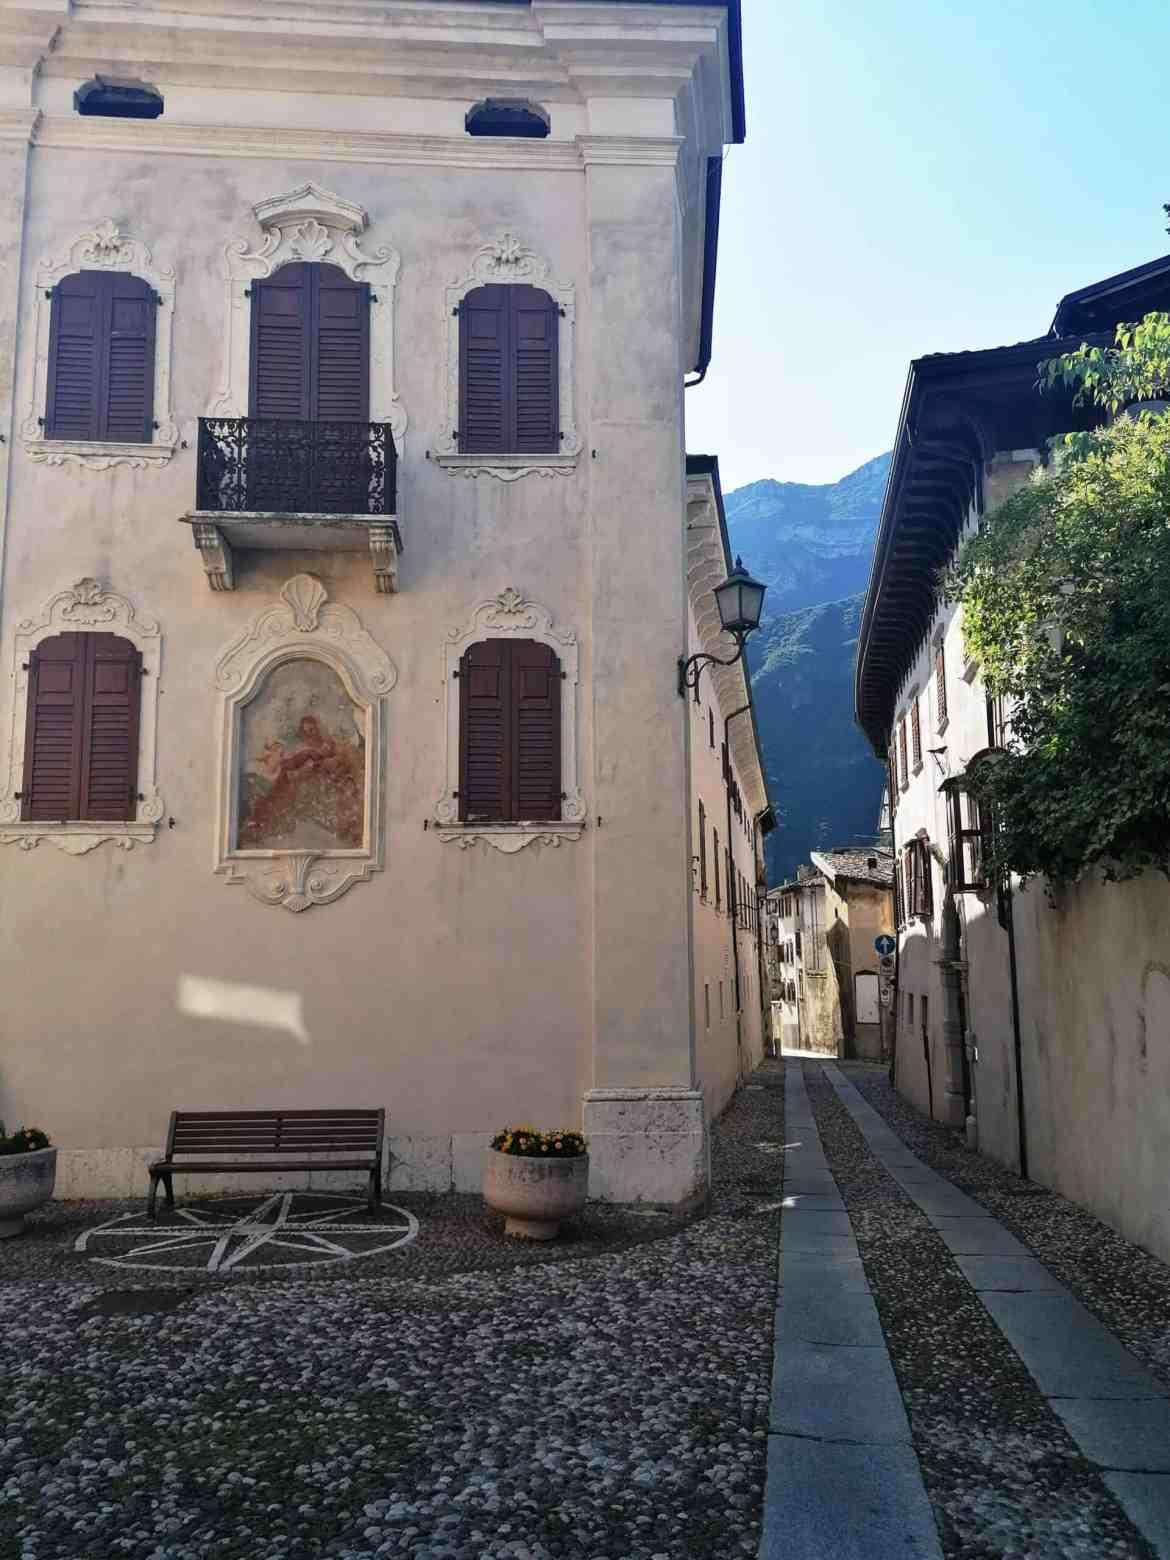 Palazzo de' Pizzini